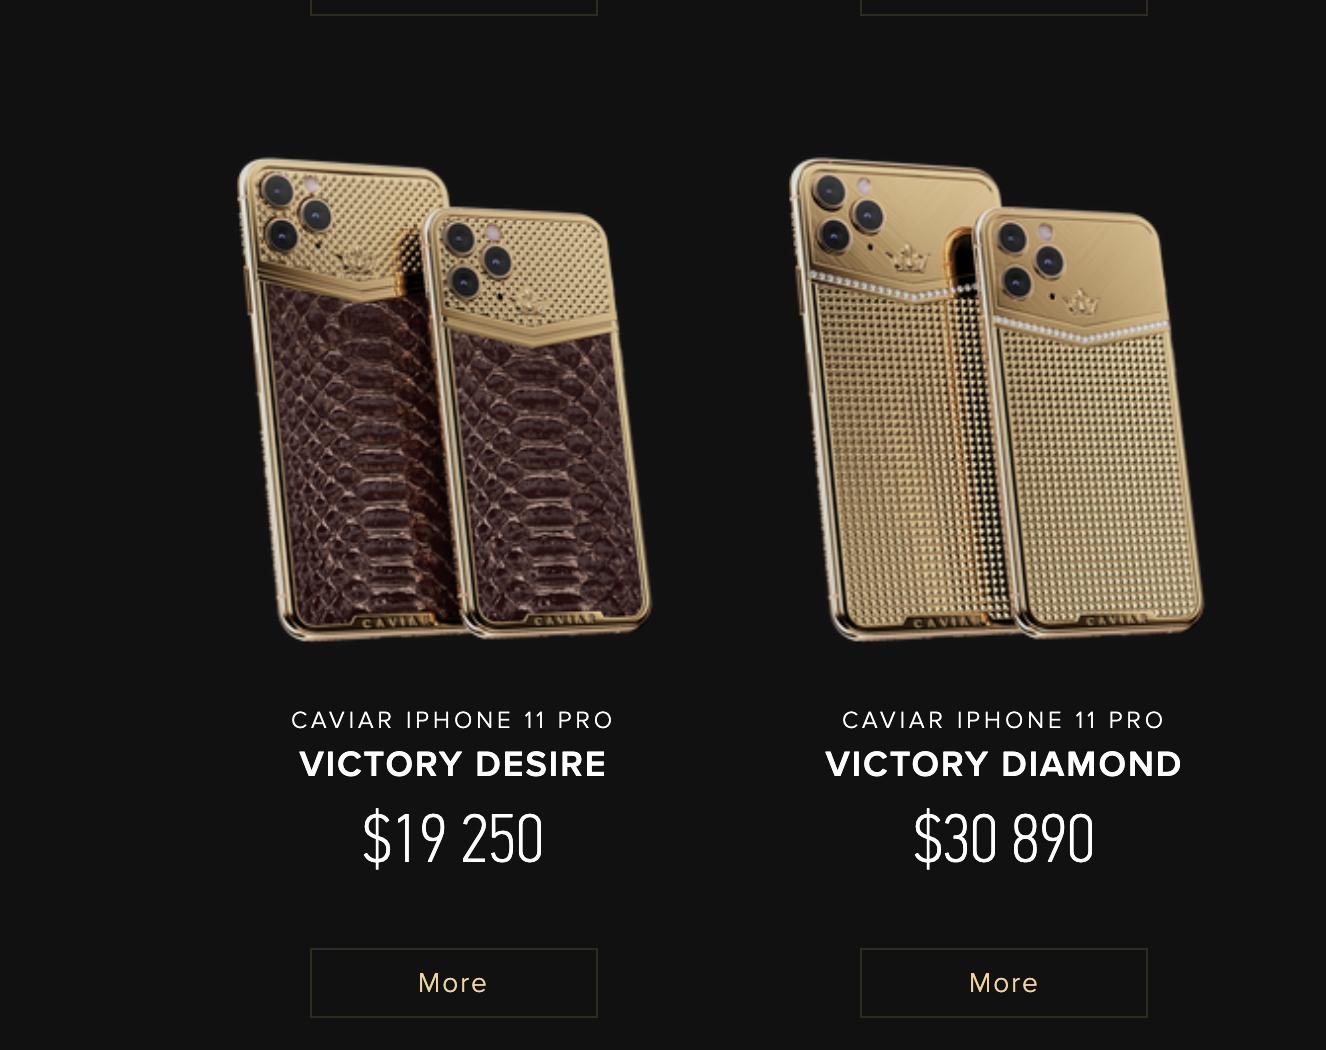 vi sao chiec iphone 11 pro max cua caviar co gia hon 700 trieu